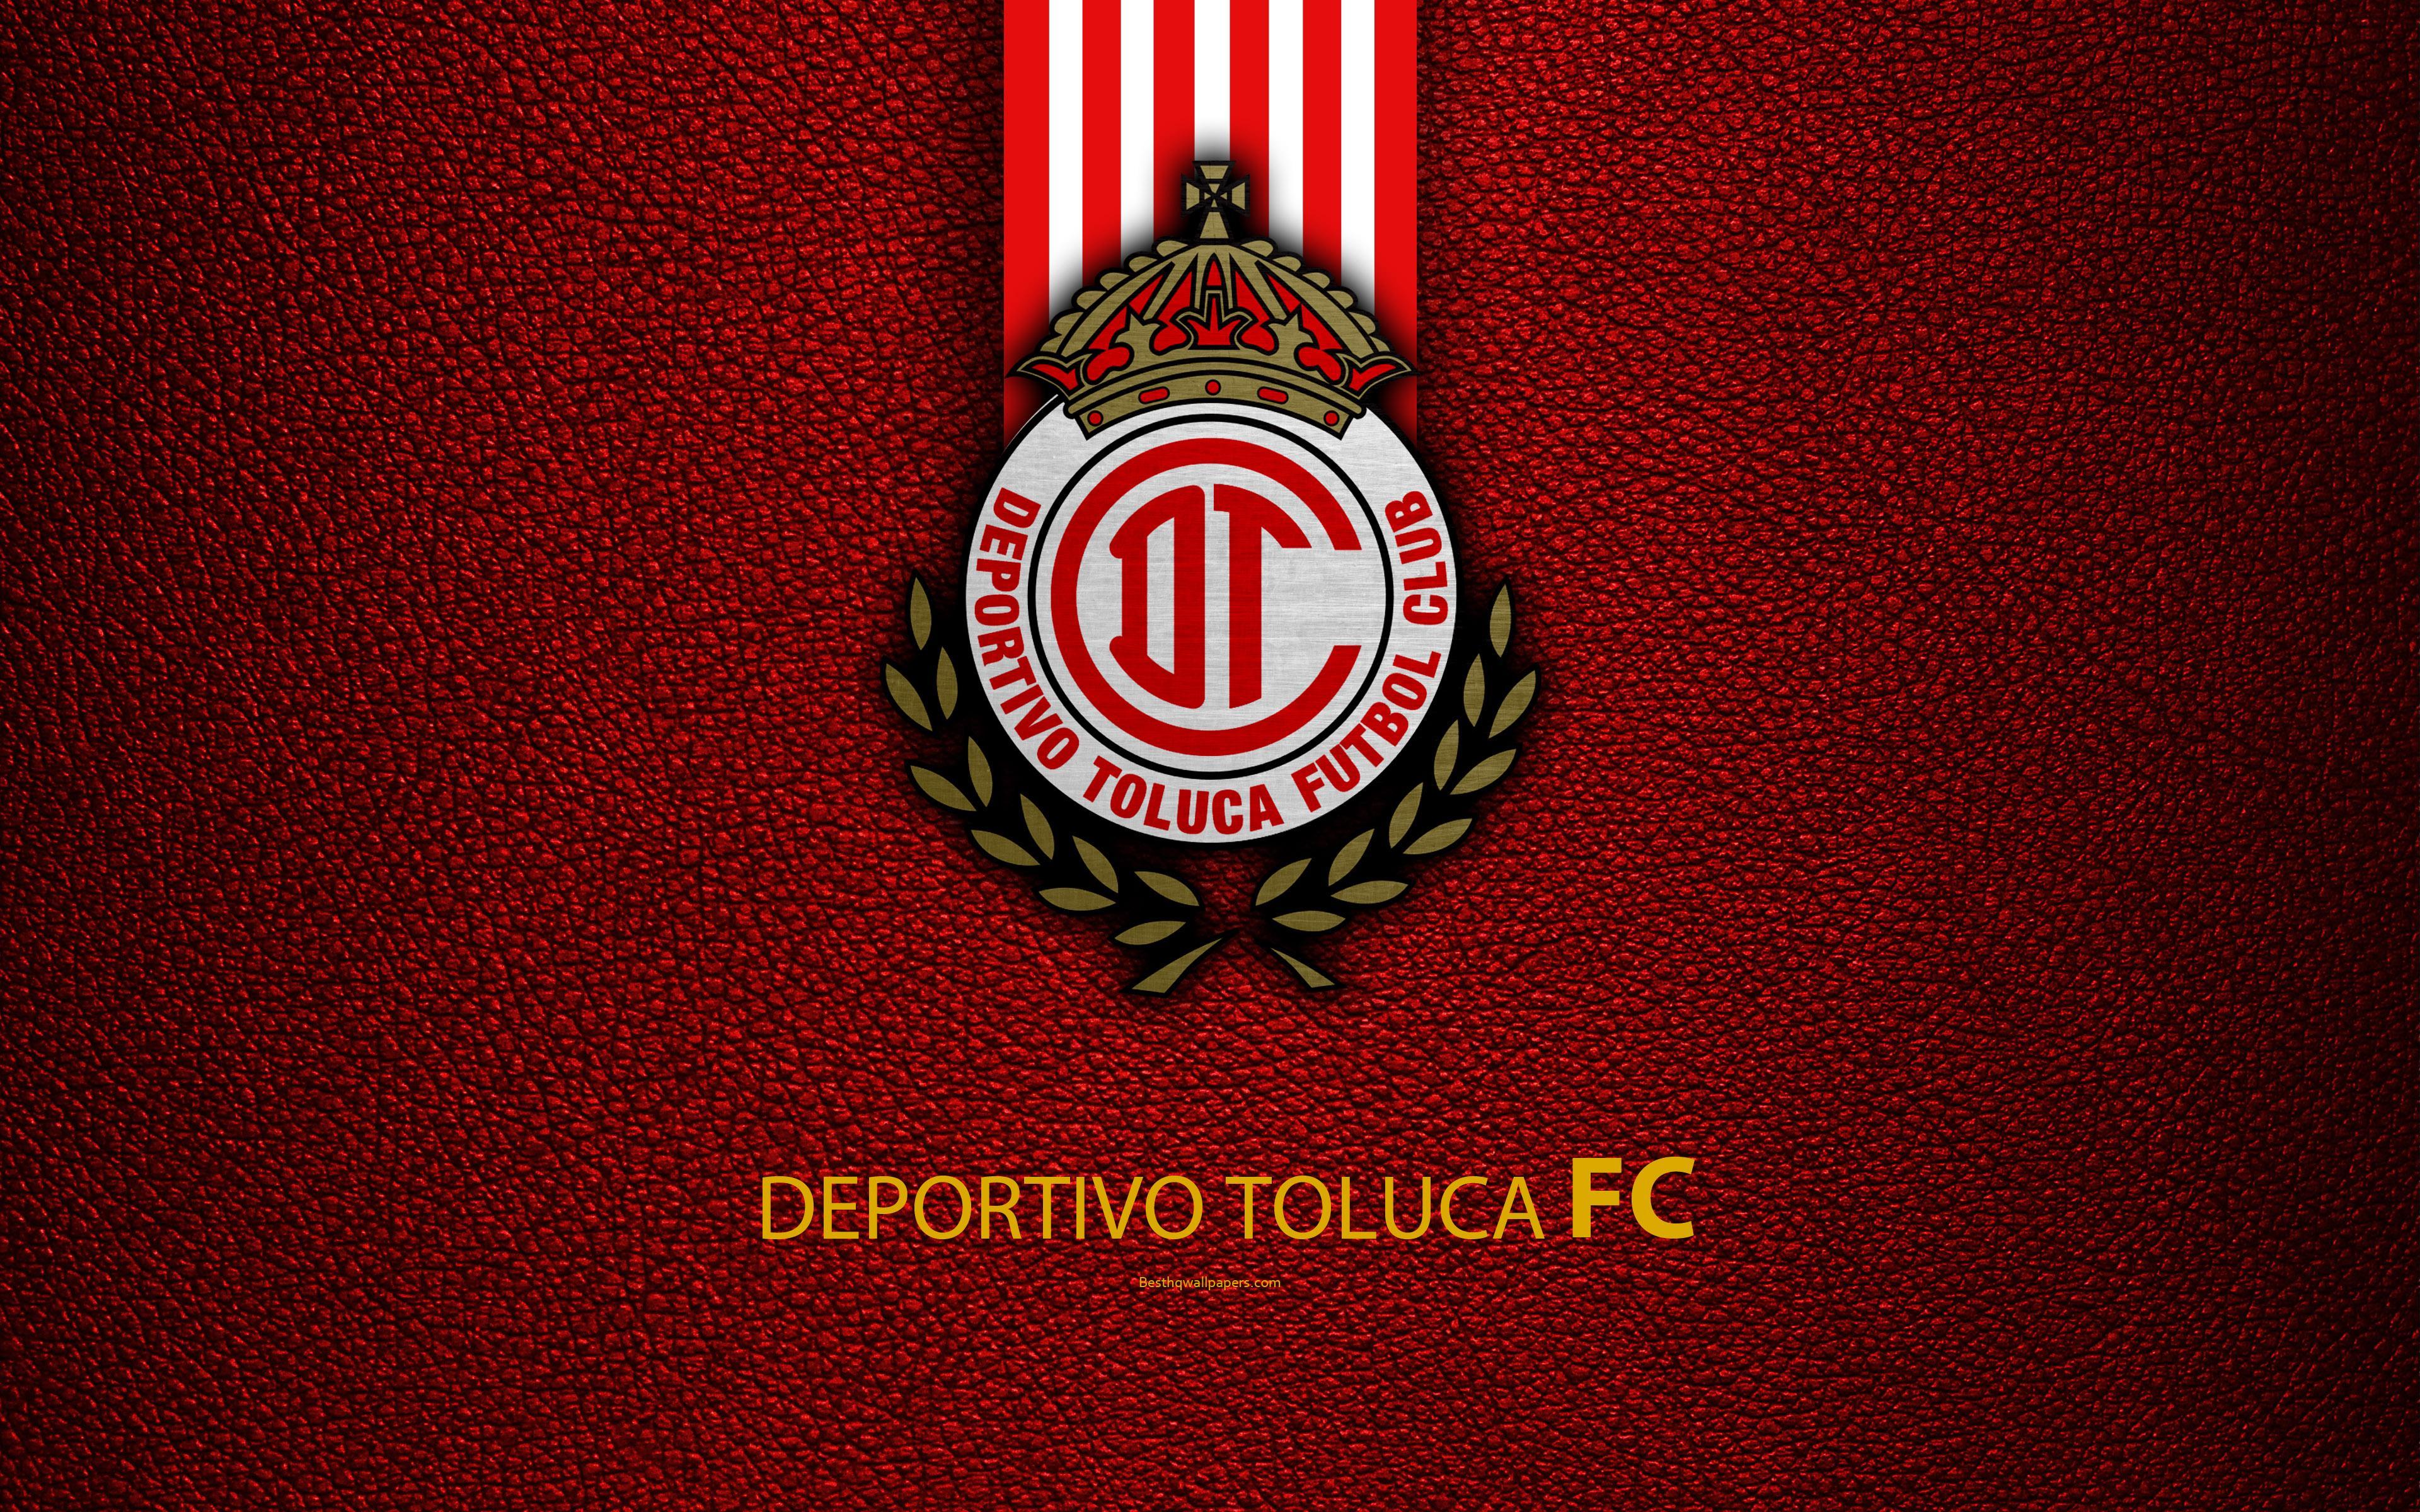 Deportivo Toluca Wallpapers - Wallpaper Cave